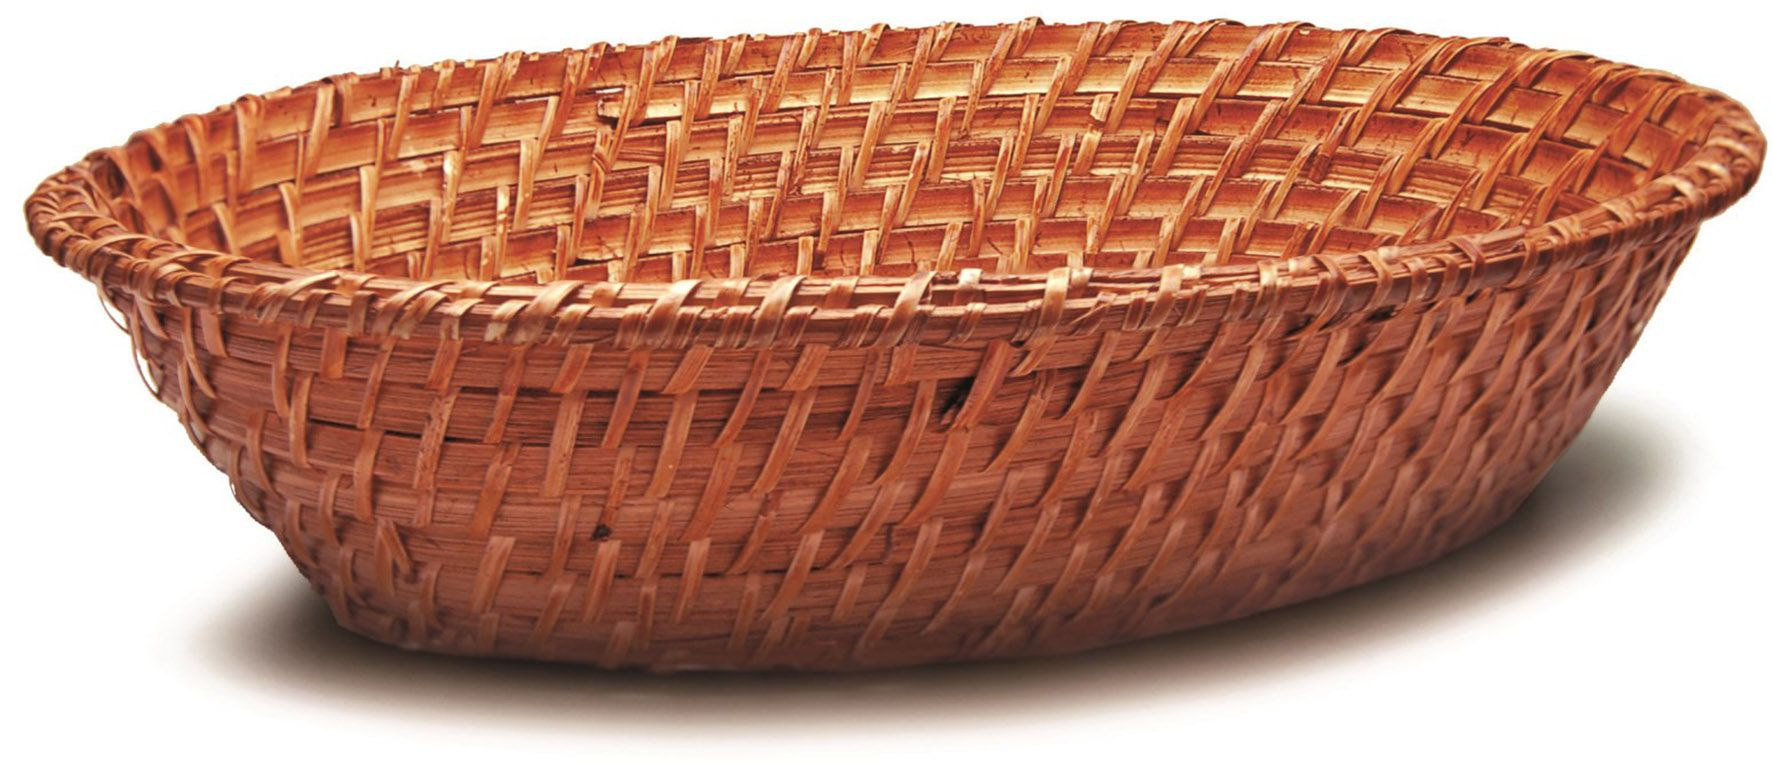 Cesto Oval Rattan 36x27x10cm - Tyft Organic